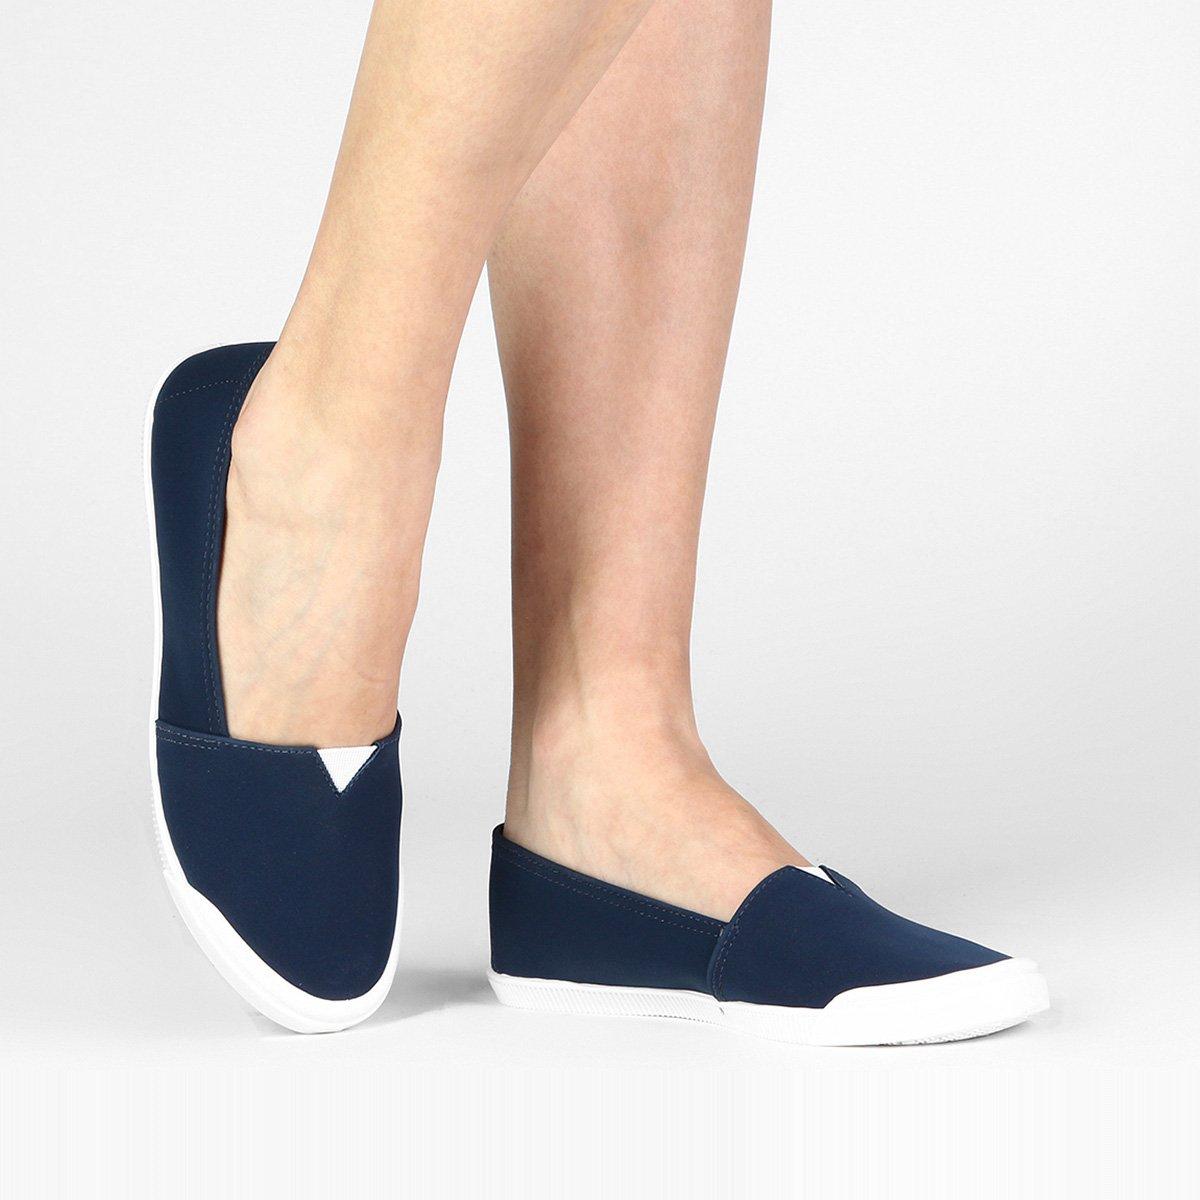 Moleca Moleca Slip Feminino On On Slip Azul Slip Azul Elástico Feminino On Elástico Elástico Moleca BqxSFx0